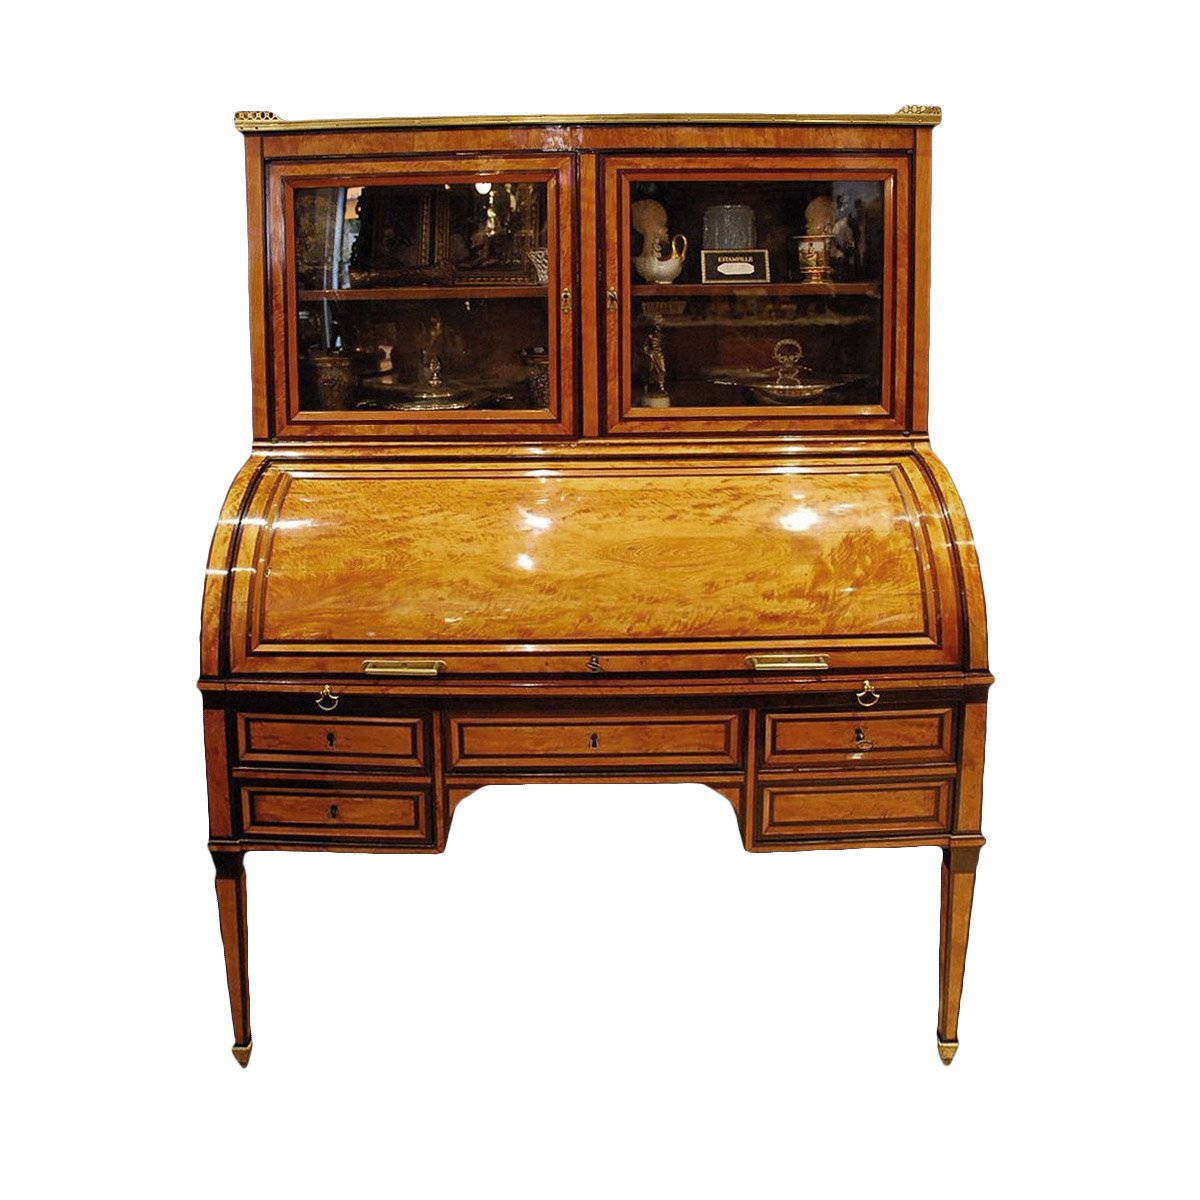 a louis xvi bureau a cylindre stamped etienne avril. Black Bedroom Furniture Sets. Home Design Ideas